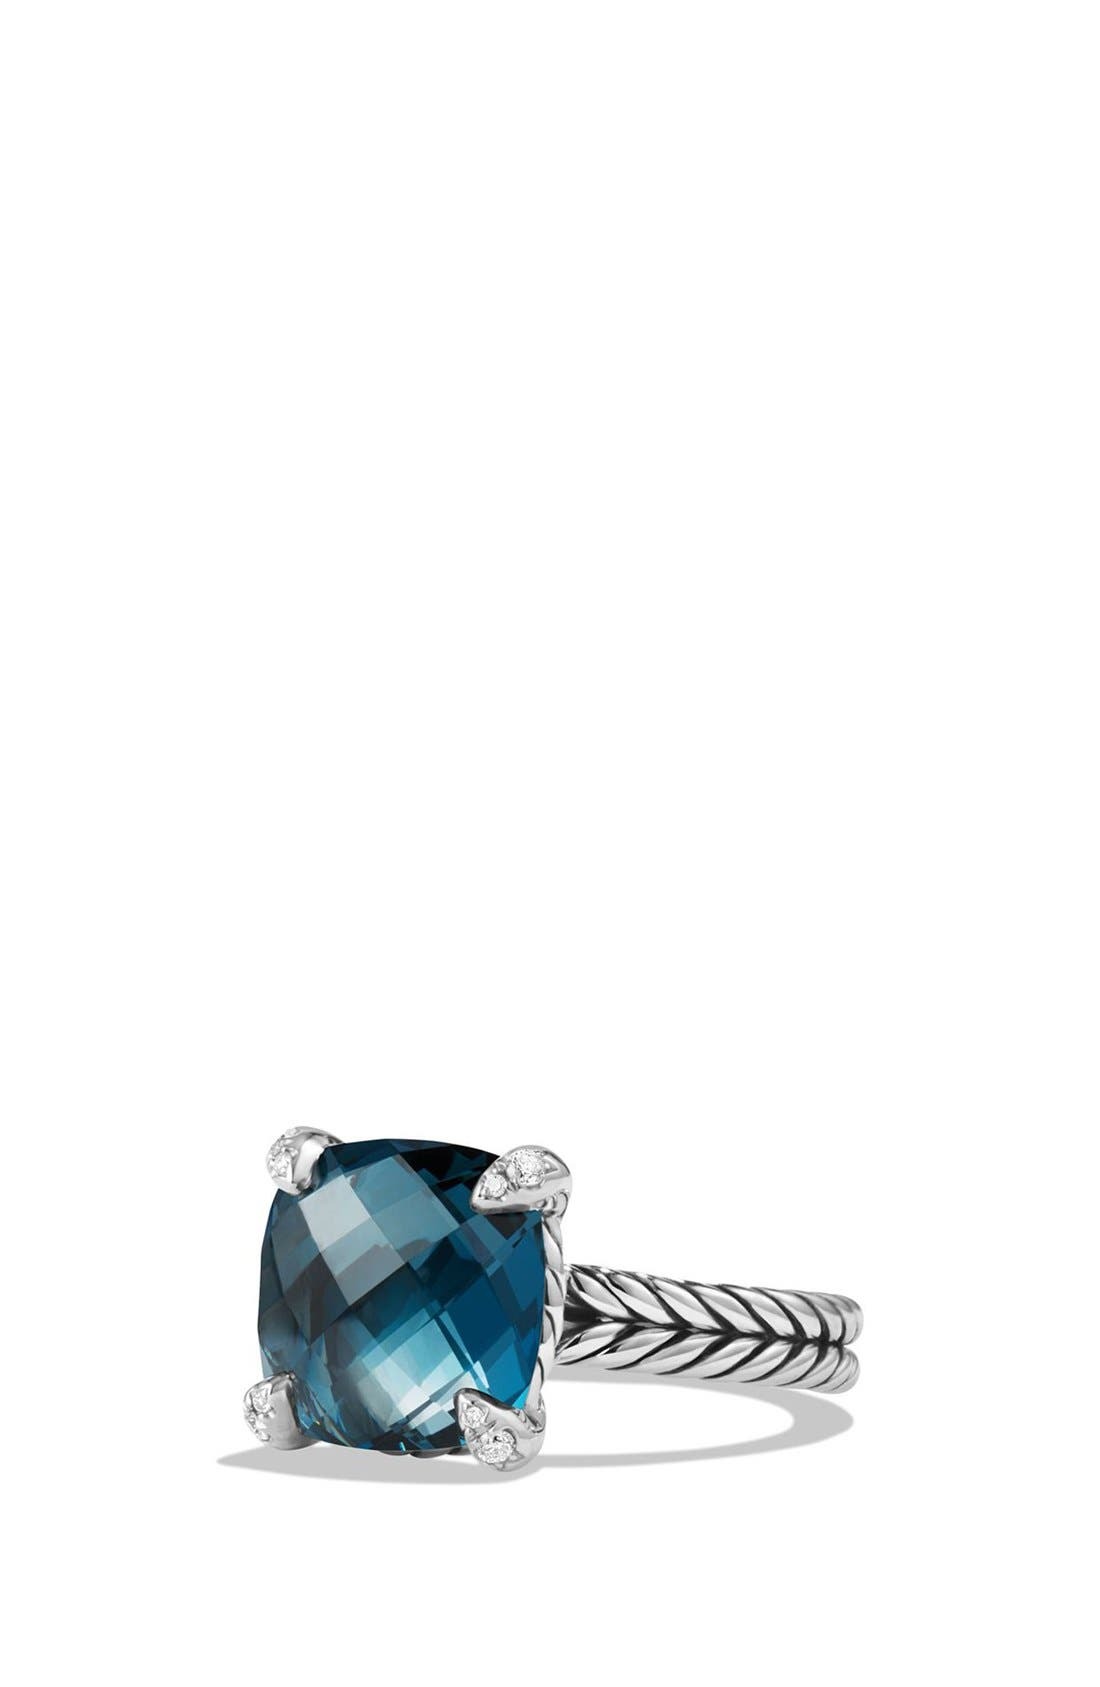 'Châtelaine' Ring with Semiprecious Stone and Diamonds,                         Main,                         color, Silver/ Hampton Blue Topaz